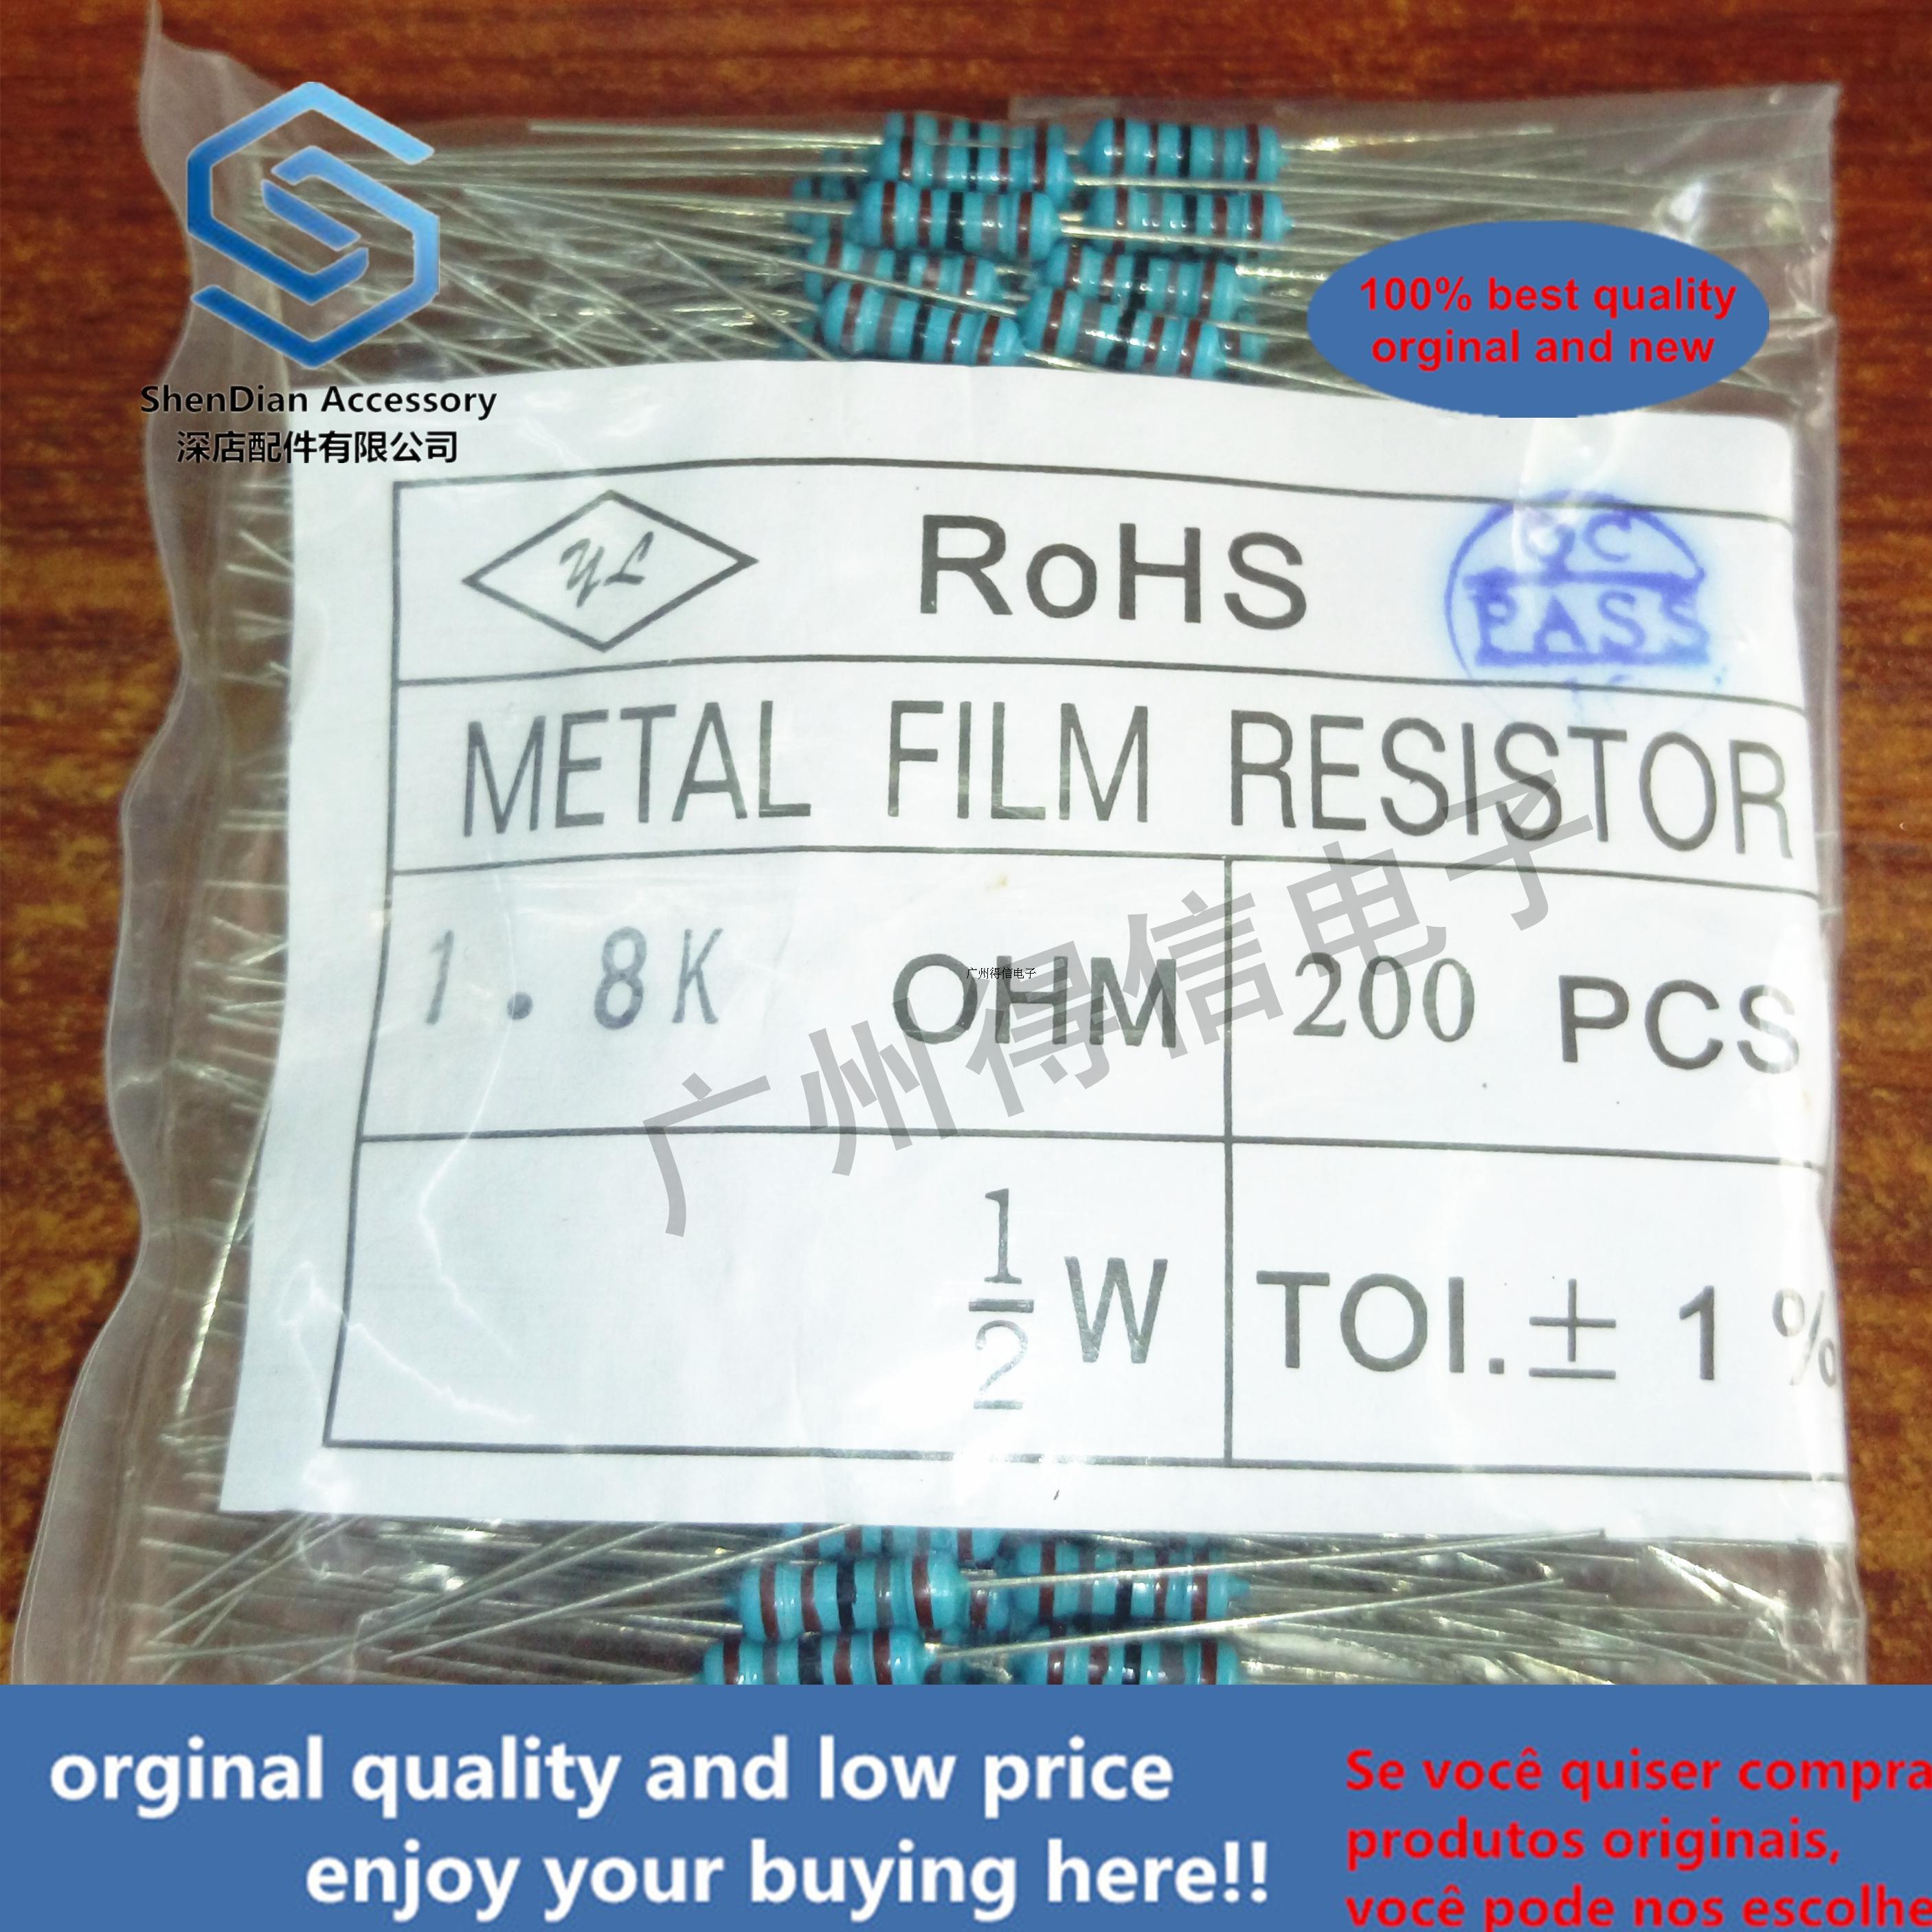 200pcs 1 / 2W 7.5K 7500 Euro 1% Brand New Metal Film Iron Feet Resistor Bag 200 Pcs Per Pack